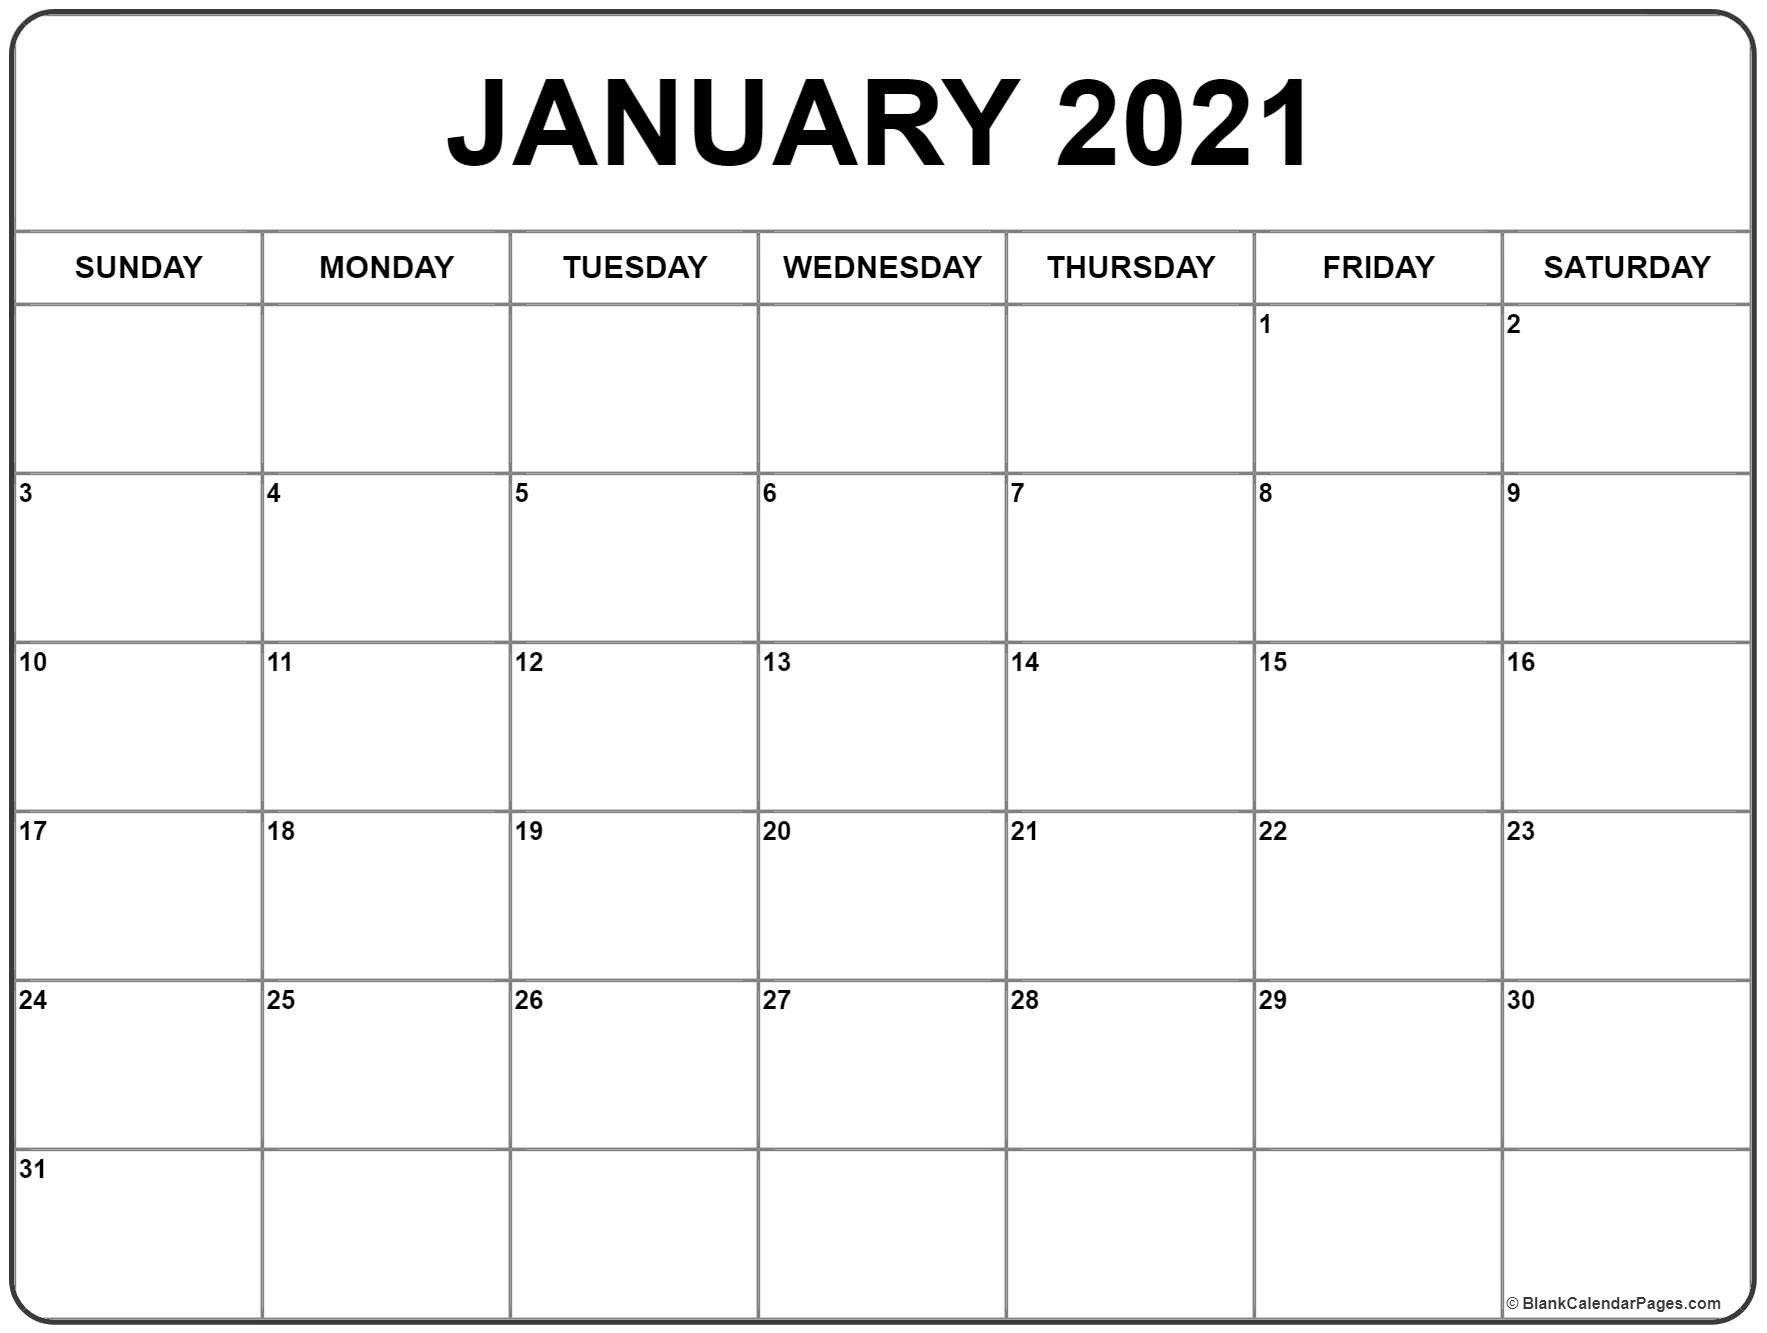 Free January 2021 Calendar Page | Print Calendar, Calendar